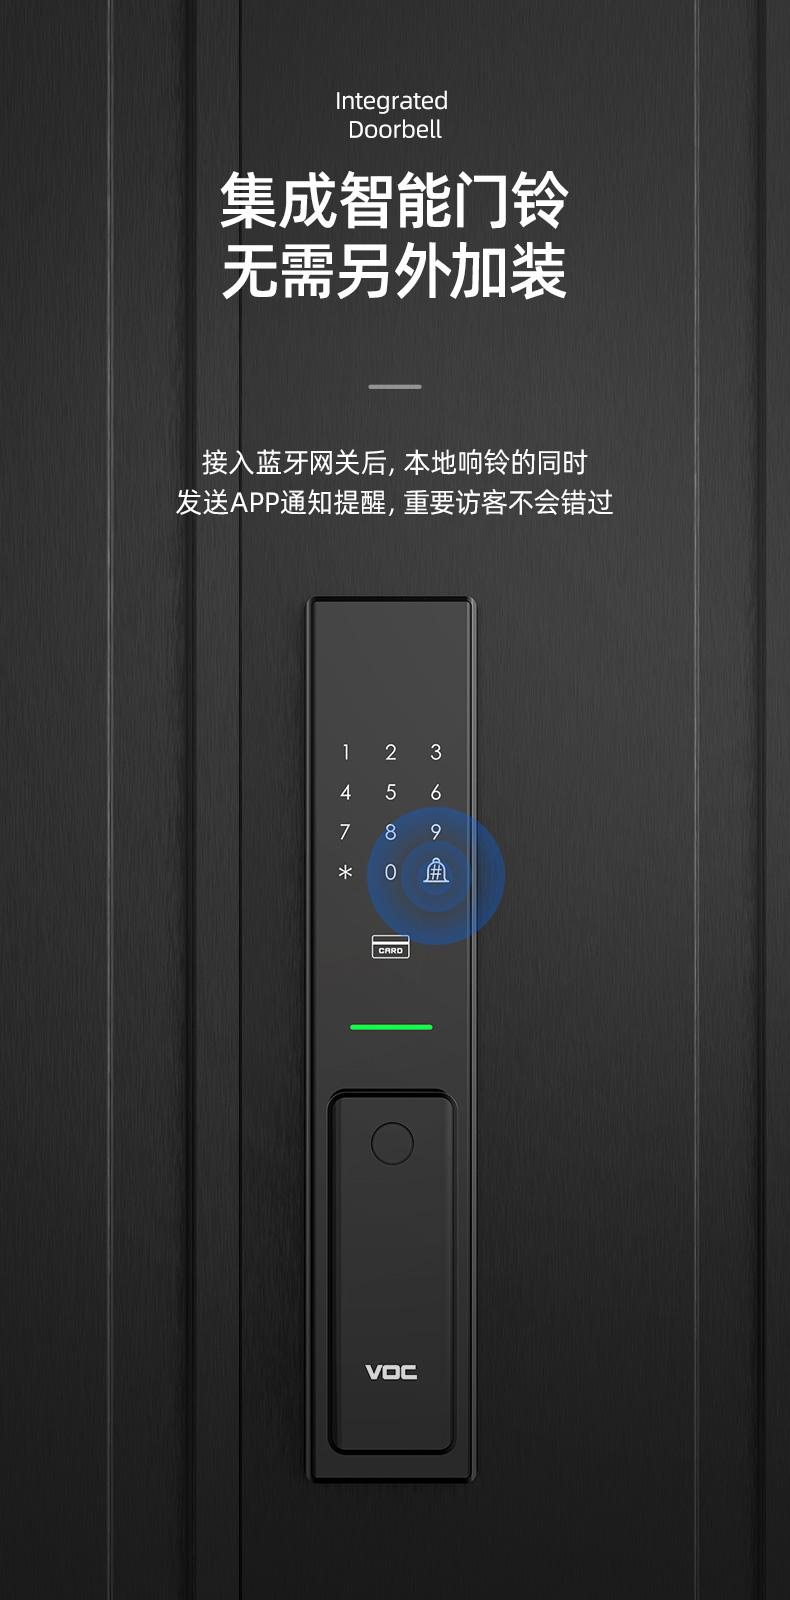 T8详情-黑色-涂鸦-门铃_11-1.jpg